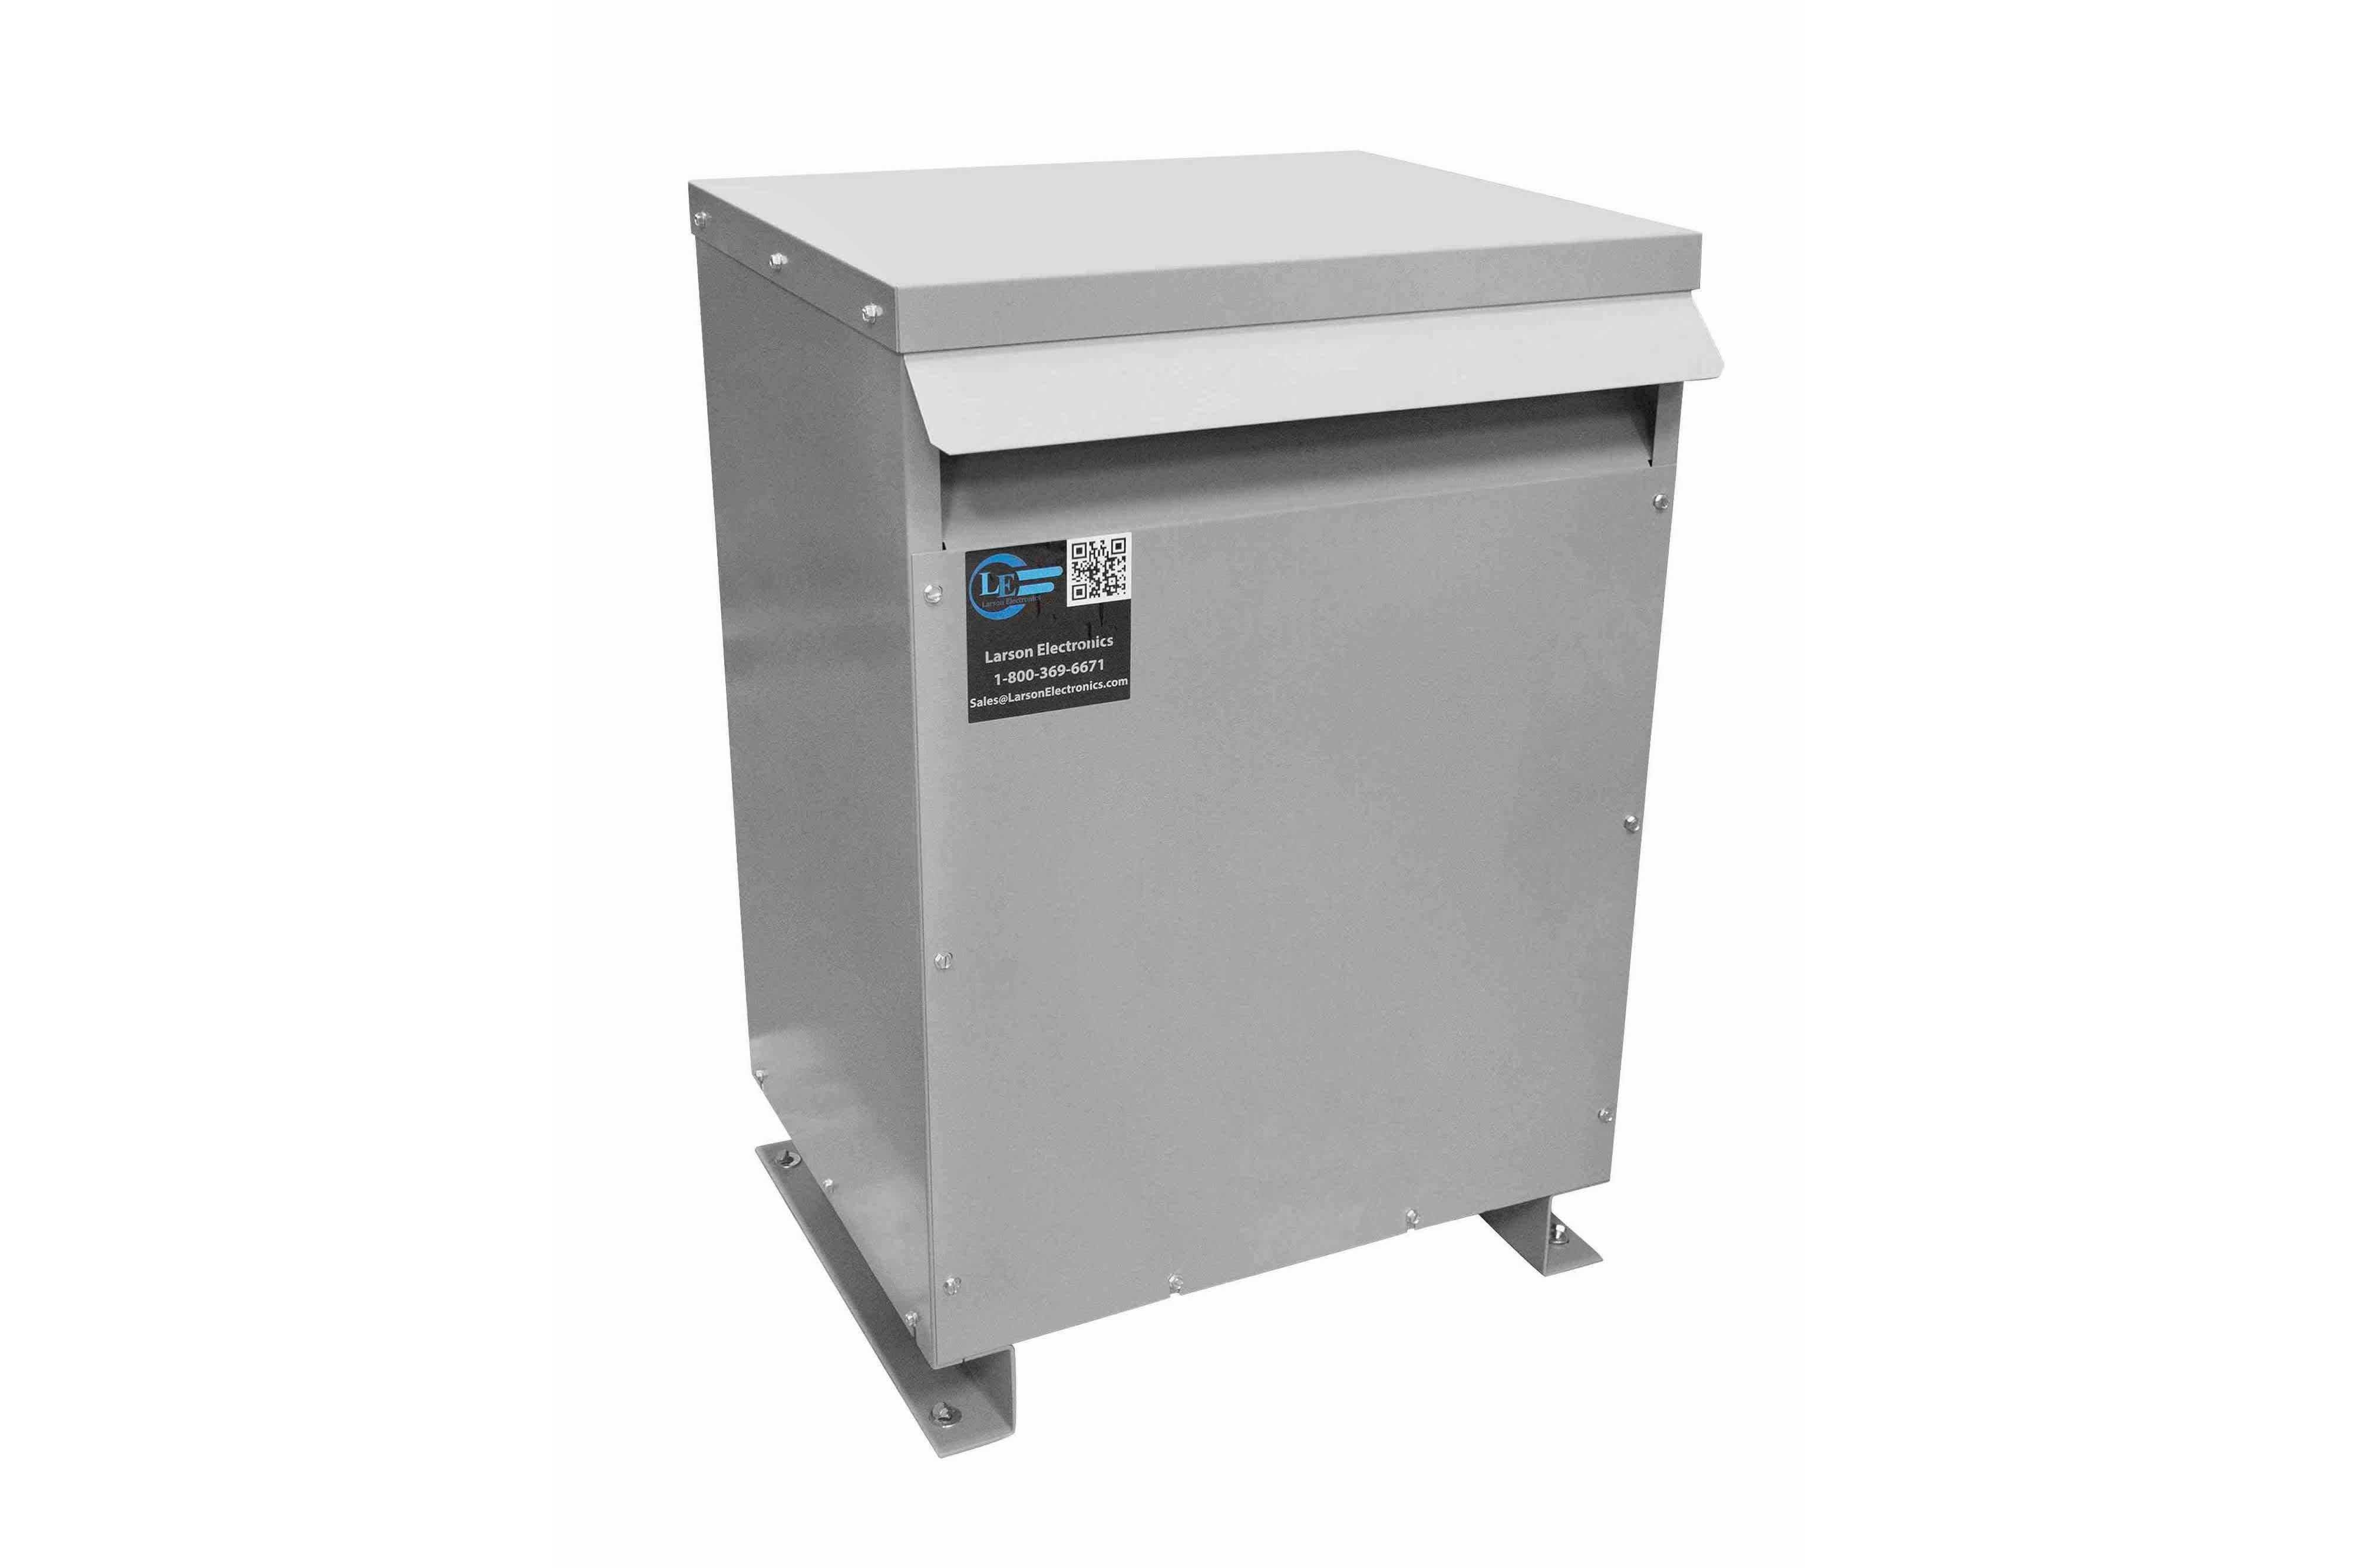 13 kVA 3PH Isolation Transformer, 415V Wye Primary, 208V Delta Secondary, N3R, Ventilated, 60 Hz